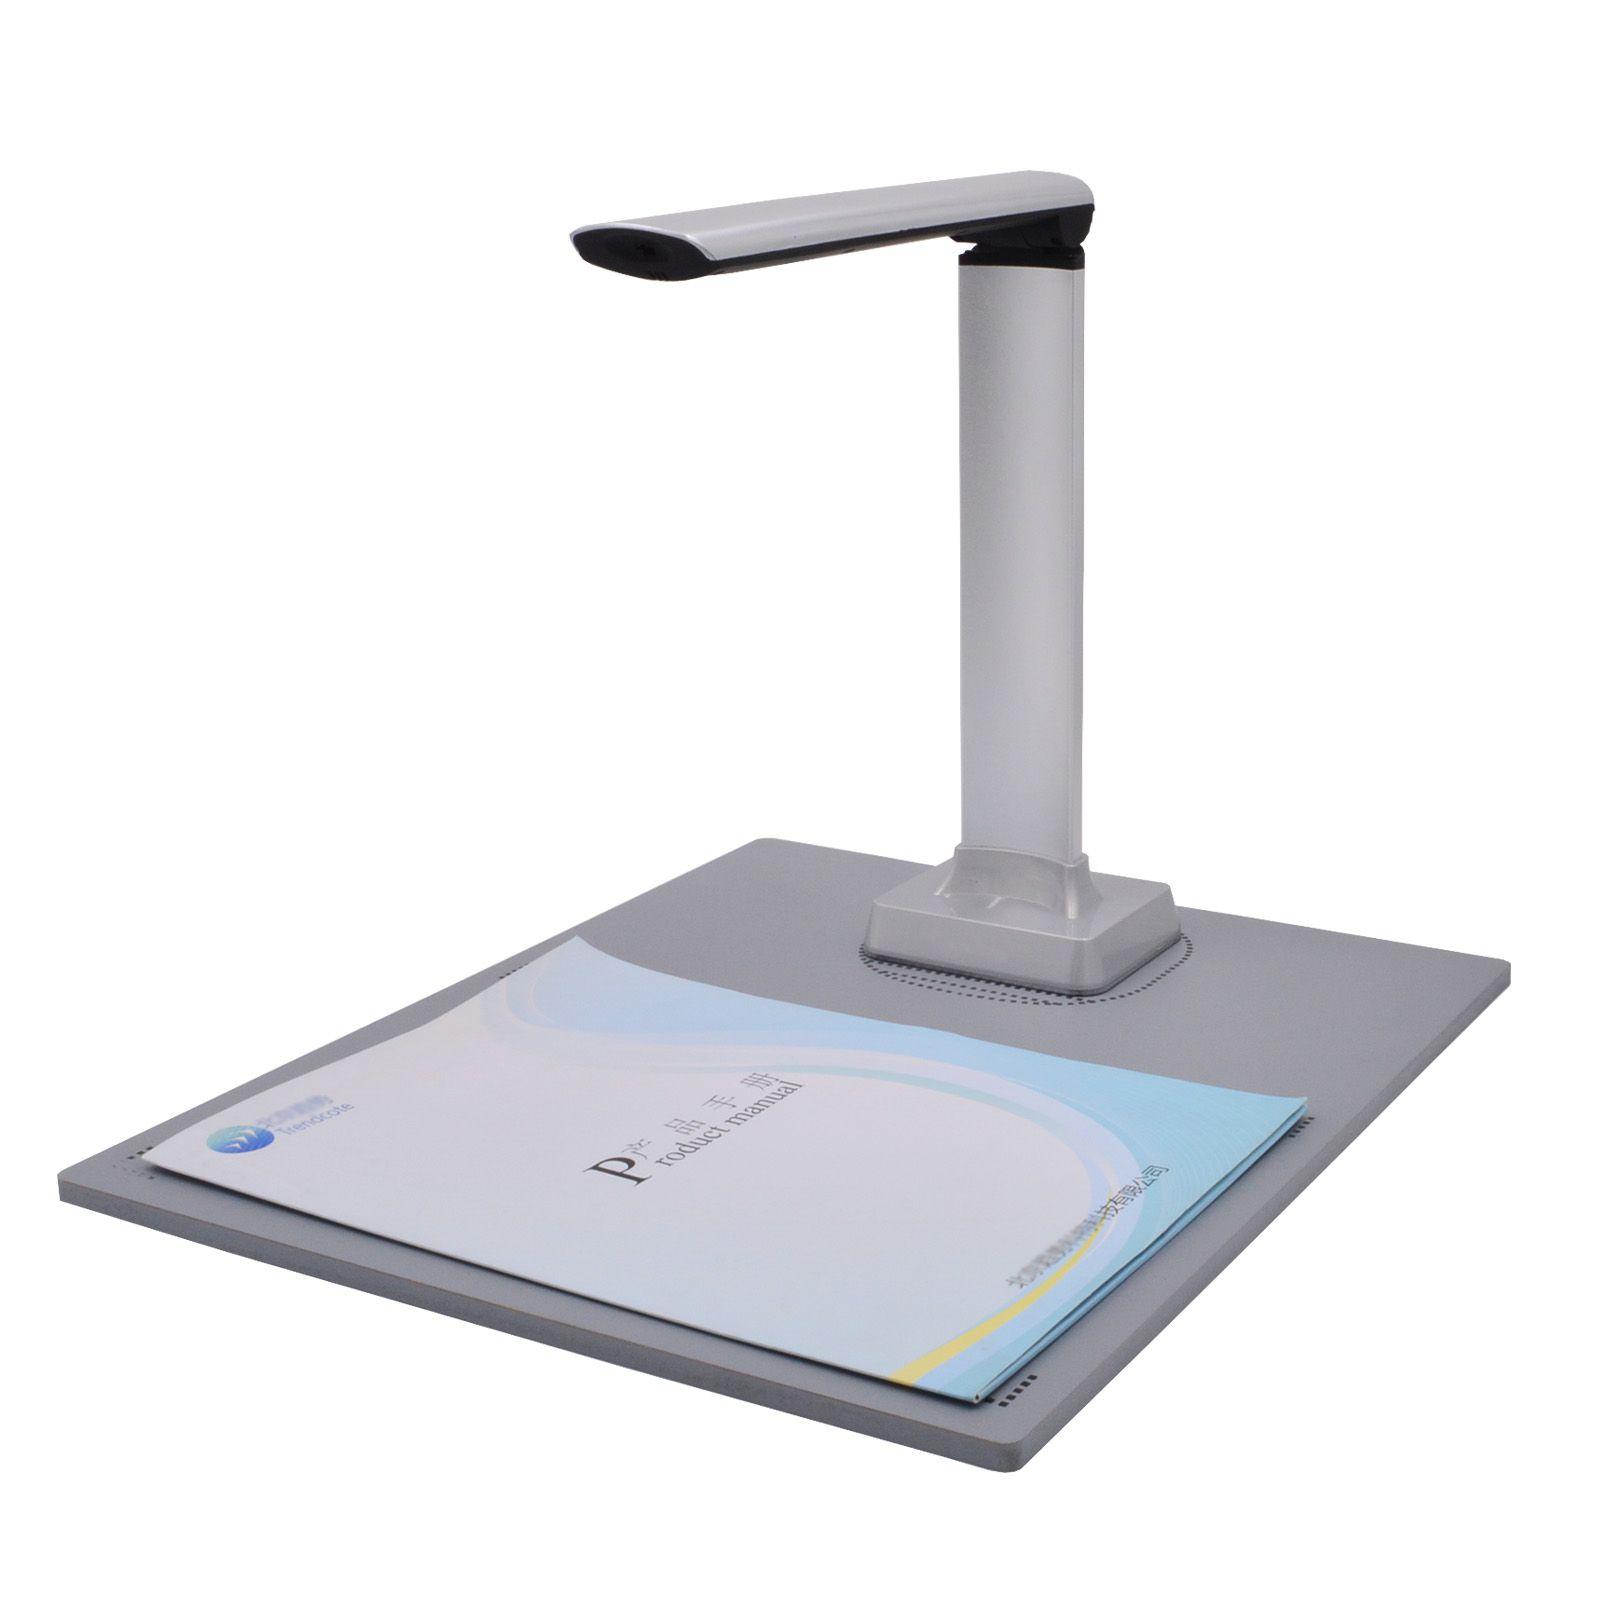 Tragbare High-Speed 12-Mega-Pixel-Cam-Scanner A4 A5 A6 Dokumentfoto-ID-ID-Karte Visualizer-Scanner-Kamera OCR